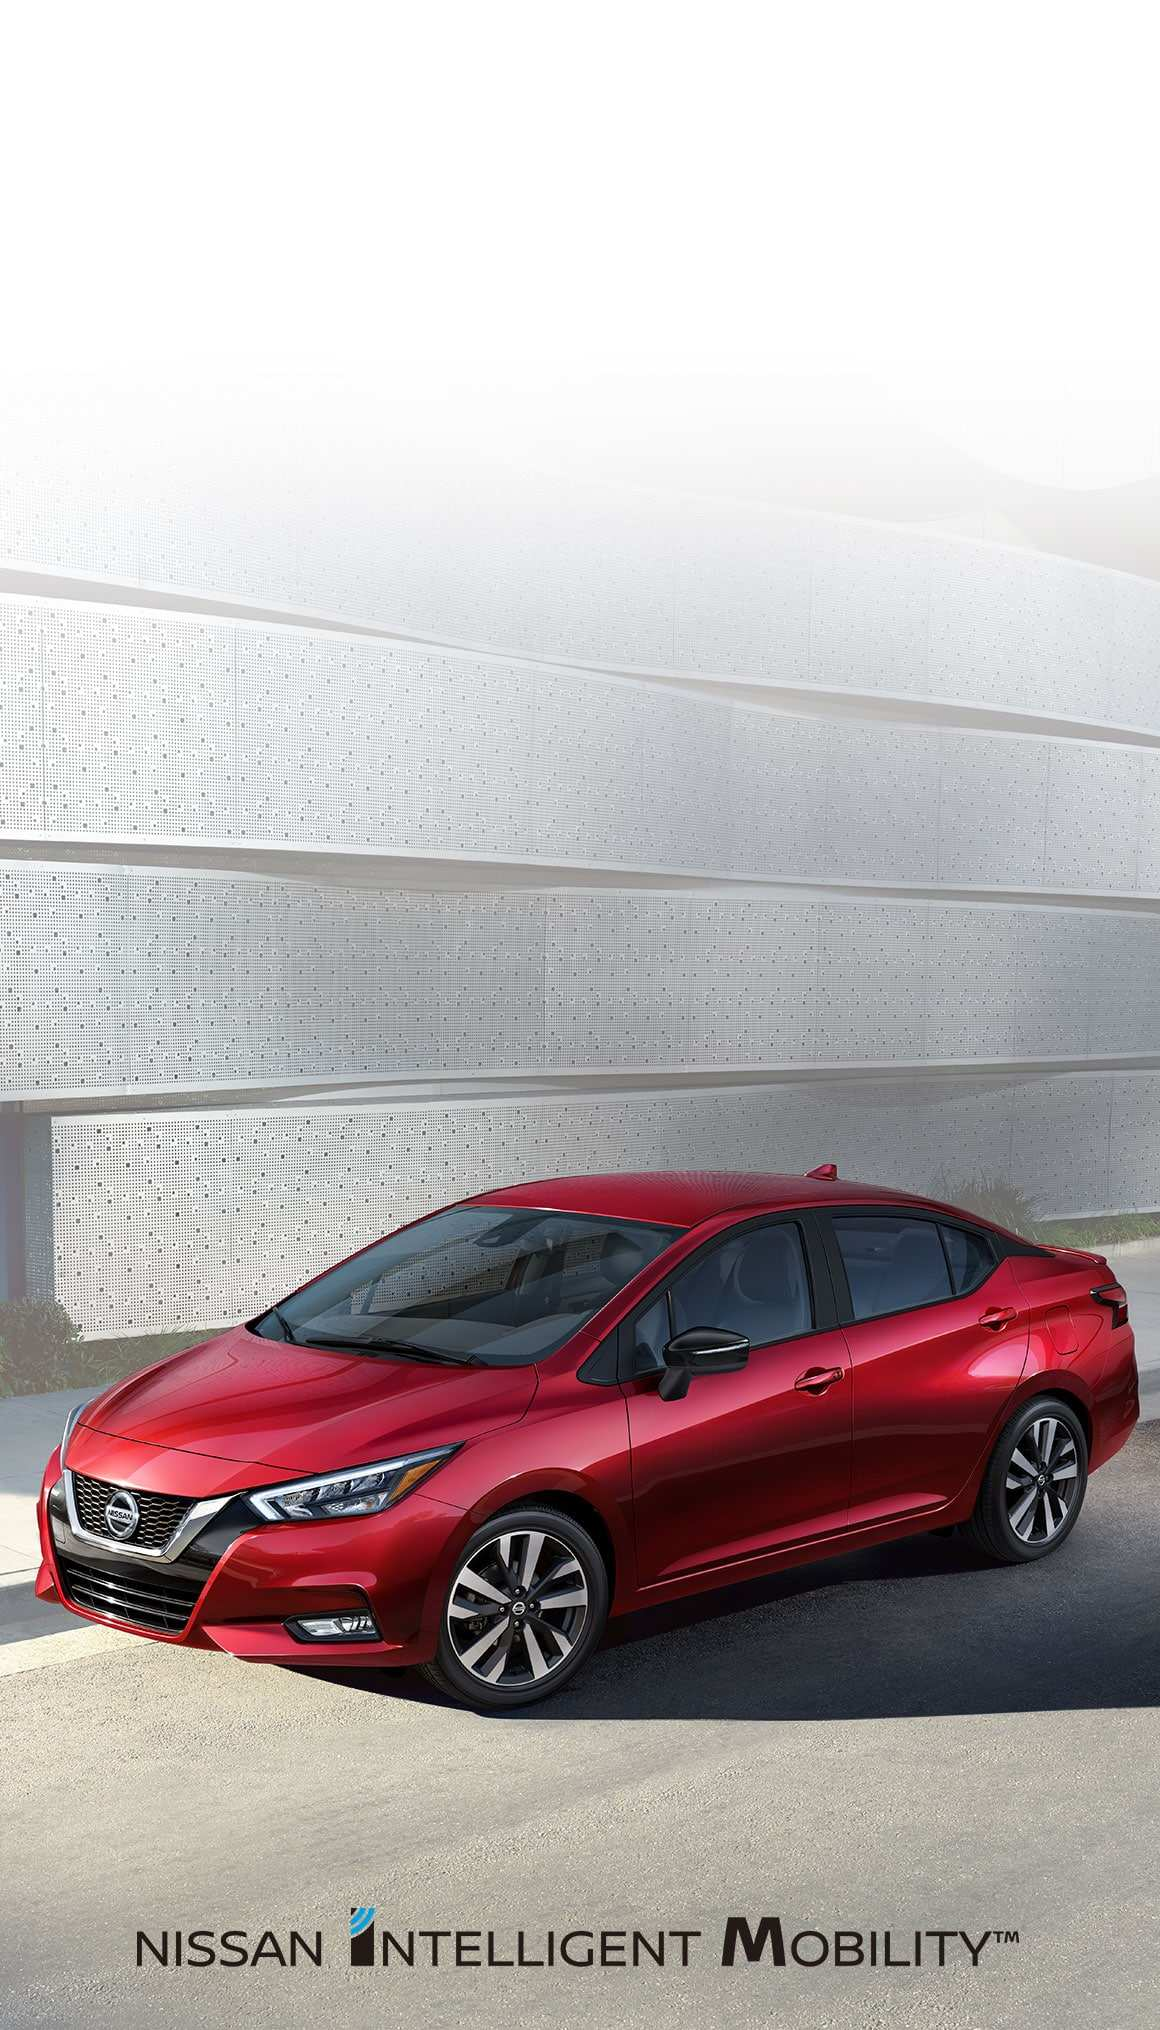 19 Great Nissan Versa 2020 Price Interior for Nissan Versa 2020 Price